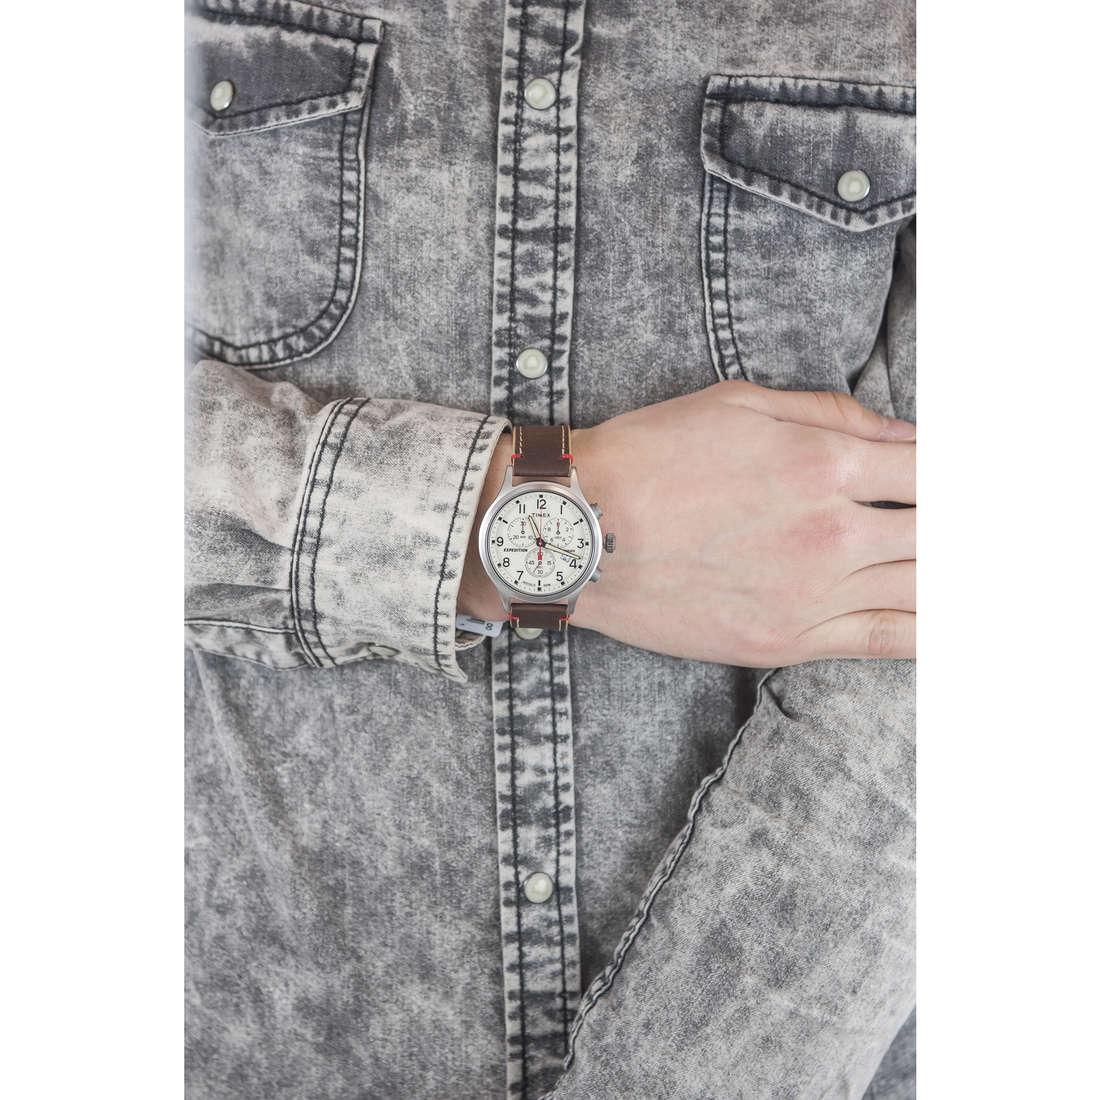 Timex chronographs Scout Chrono man TW4B04300 indosso